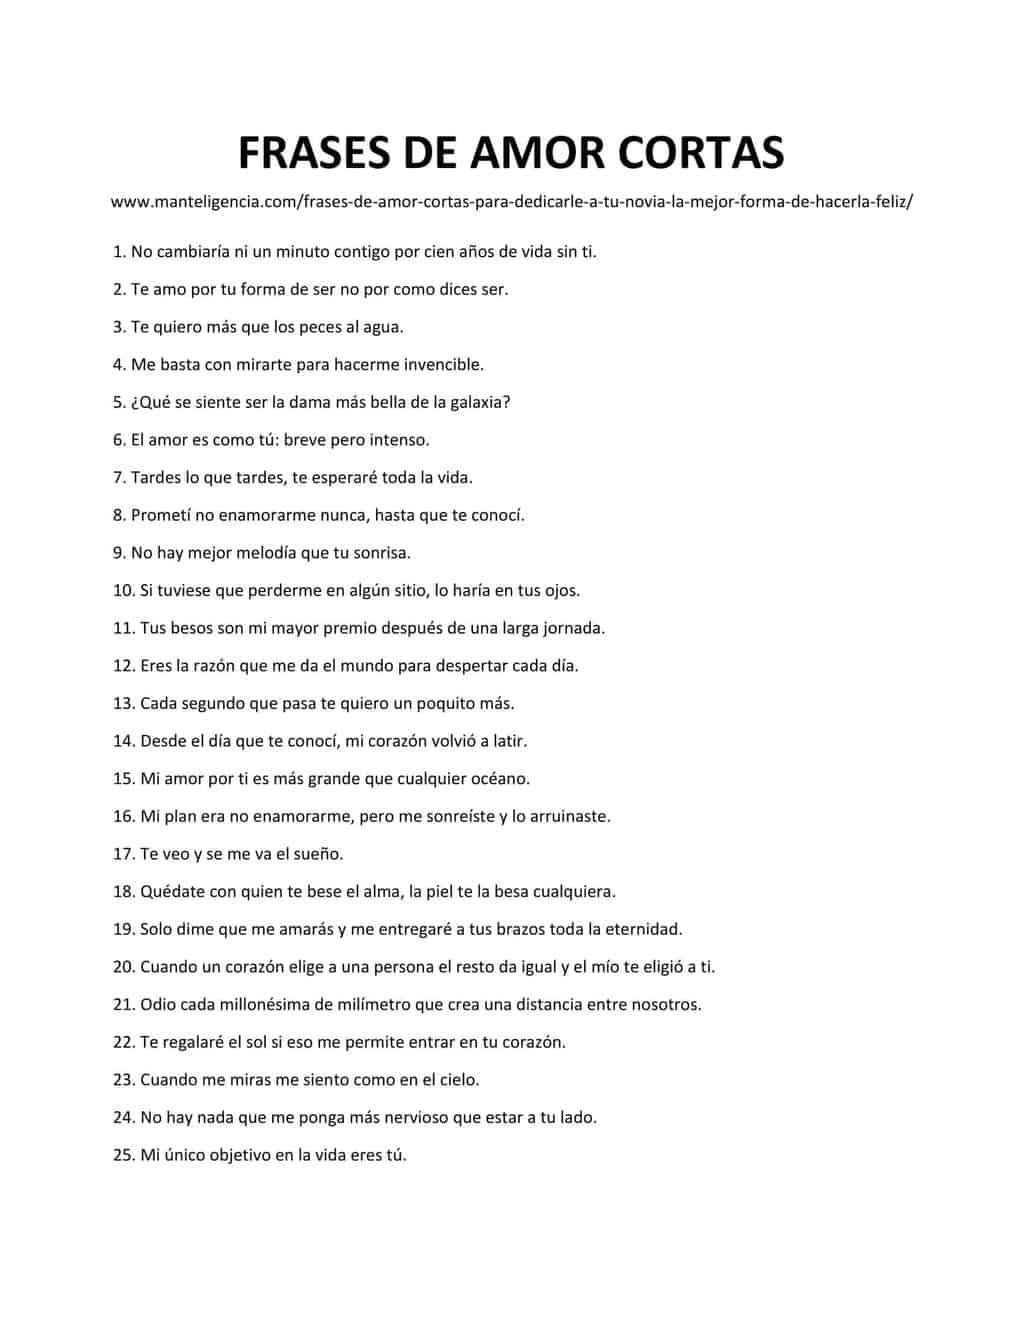 Downloadable list of FRASES DE AMOR CORTAS